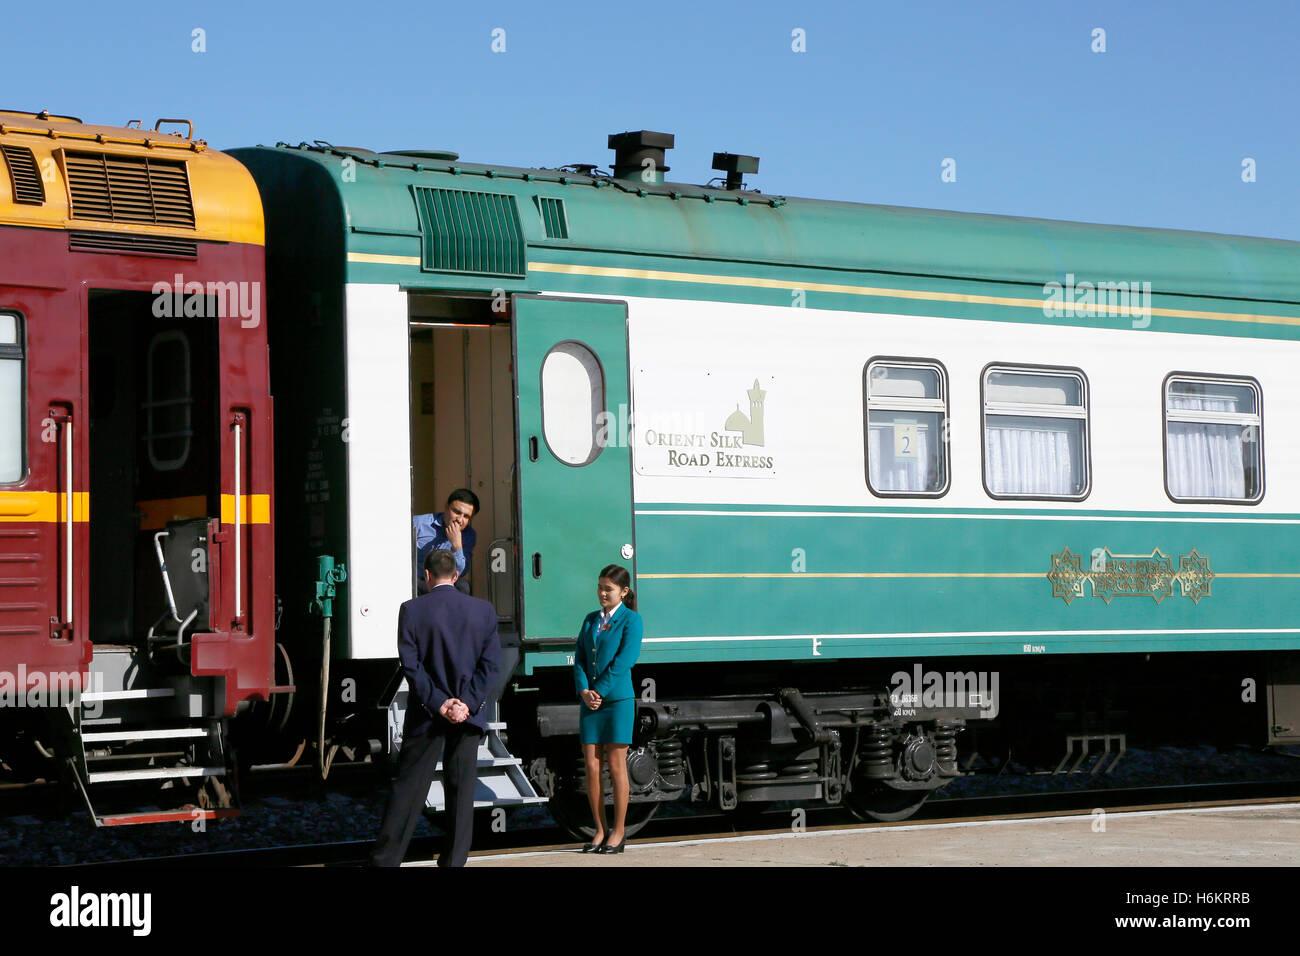 Kamashi train station, Uzbekistan. Treinstation Kamashi, Oezbekistan. The Orient Silk Road Express is waiting. Stock Photo